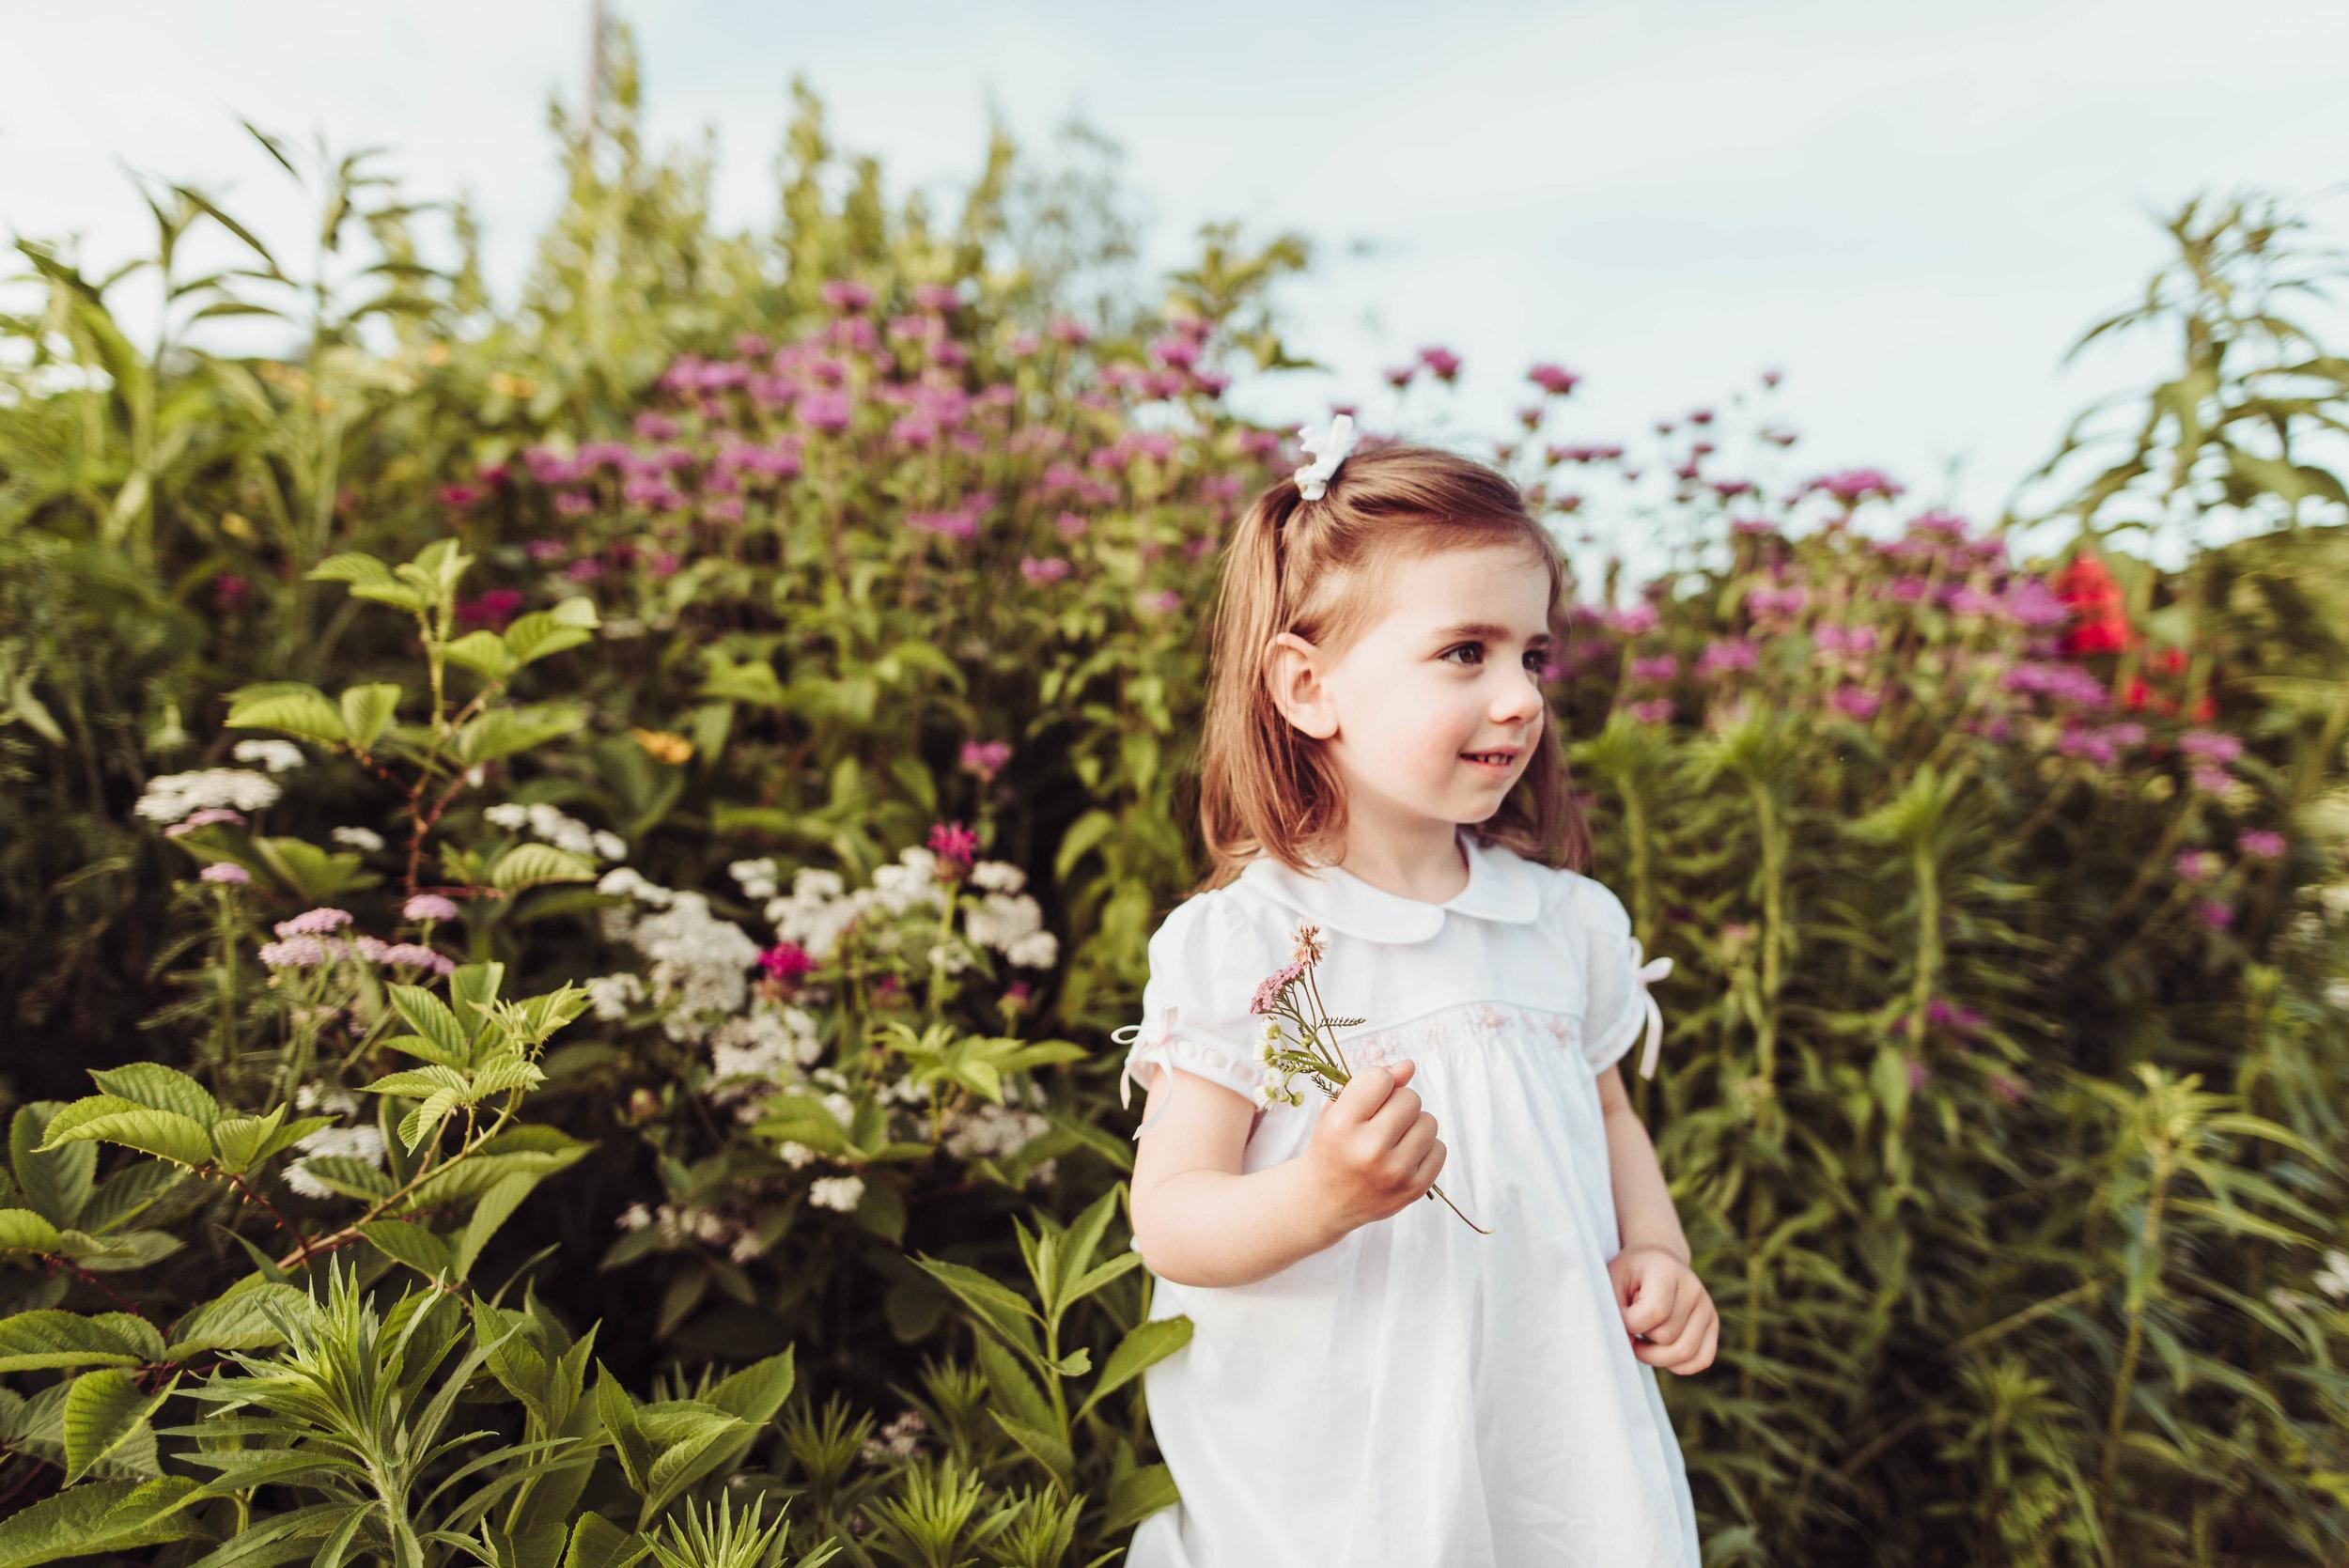 kids portraits pittsburgh-6.jpg